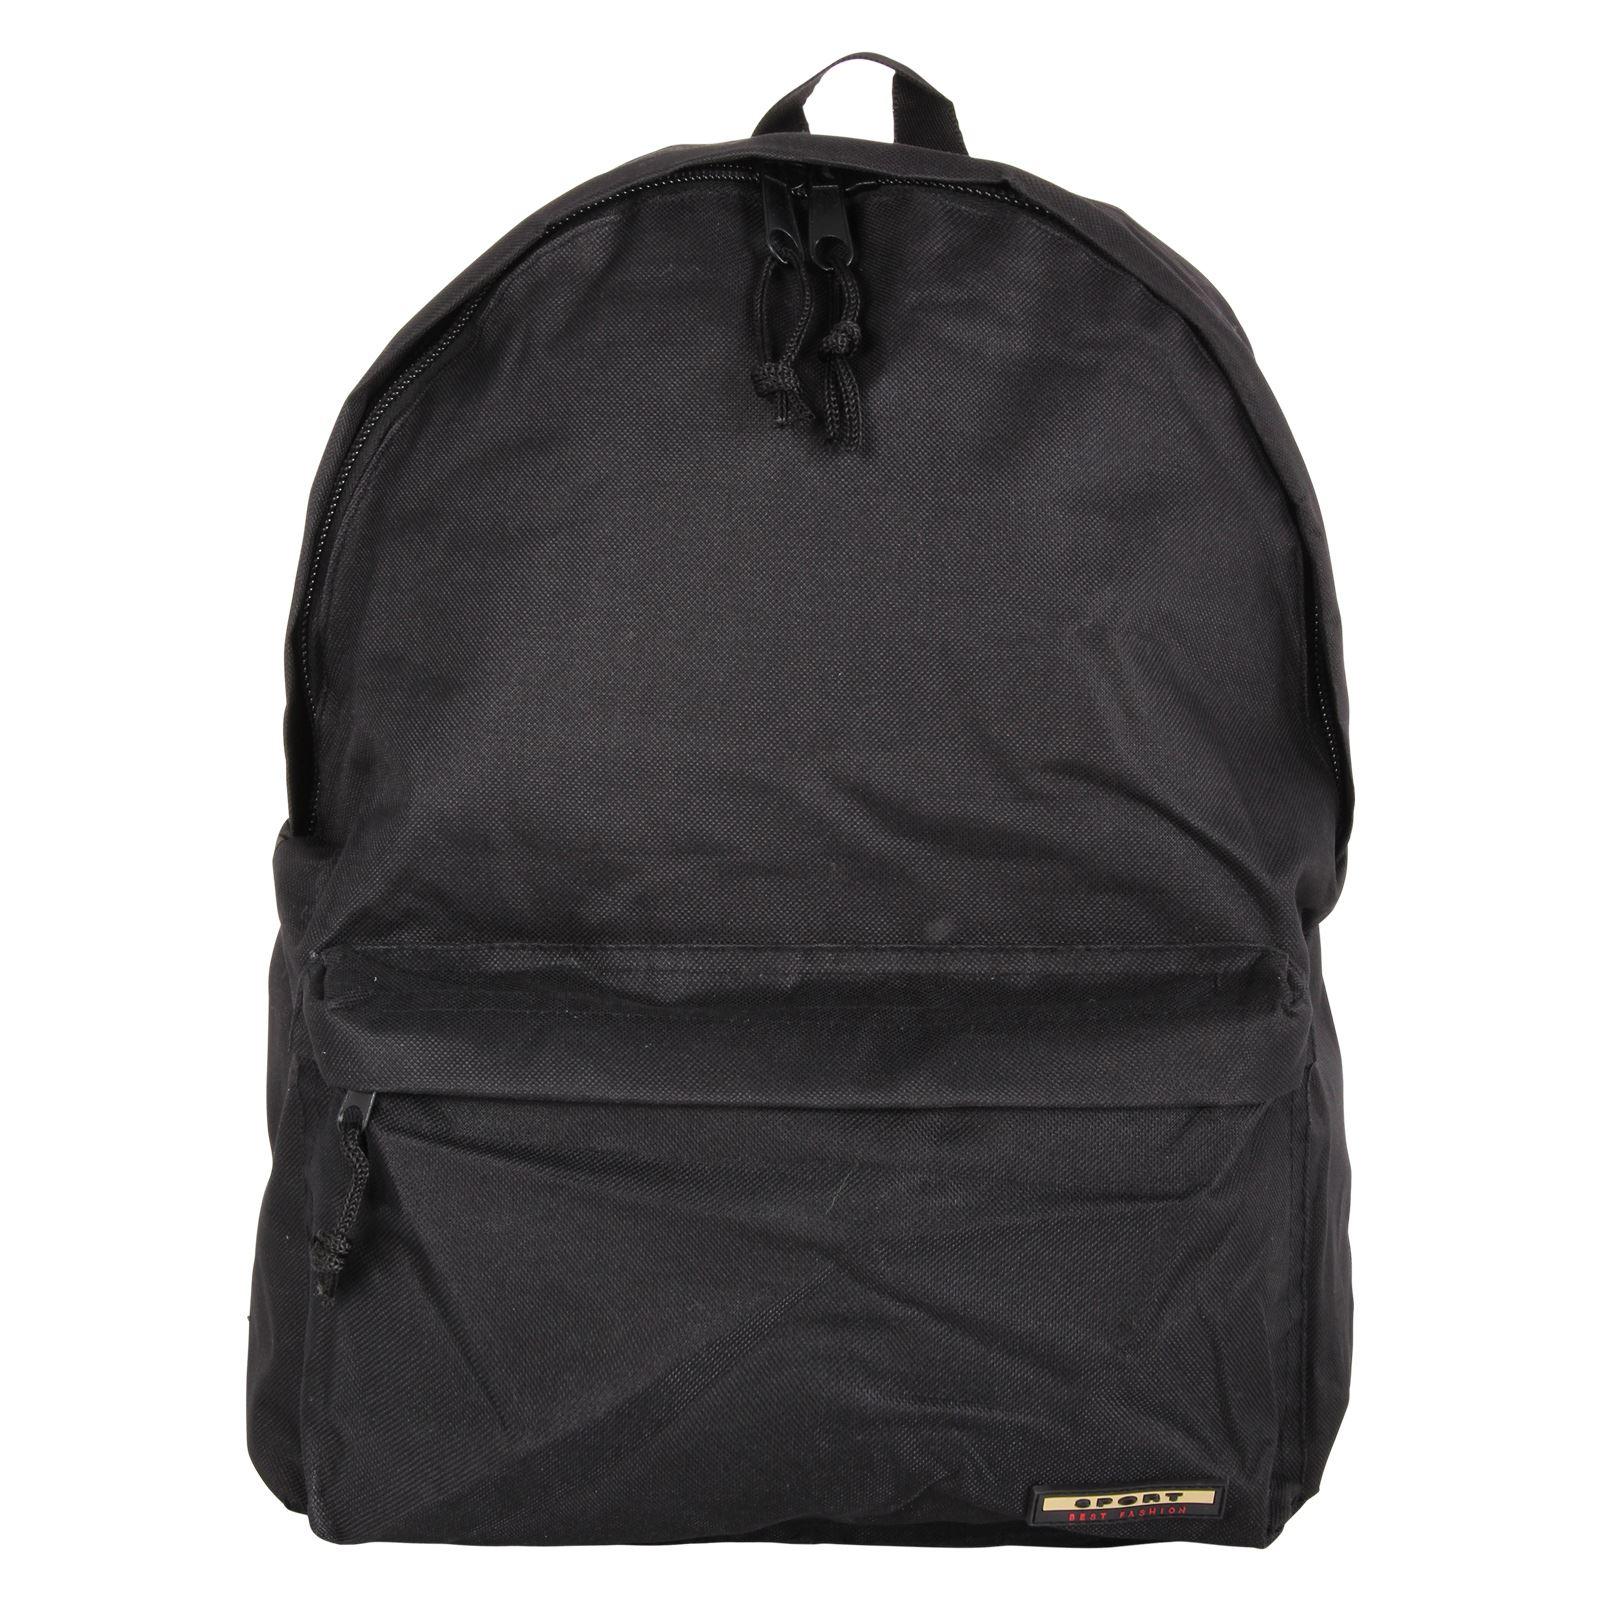 Mens-Boys-Rucksack-Backpack-School-Bag-Work-Travel-Camping-Gym-Hand-Luggage